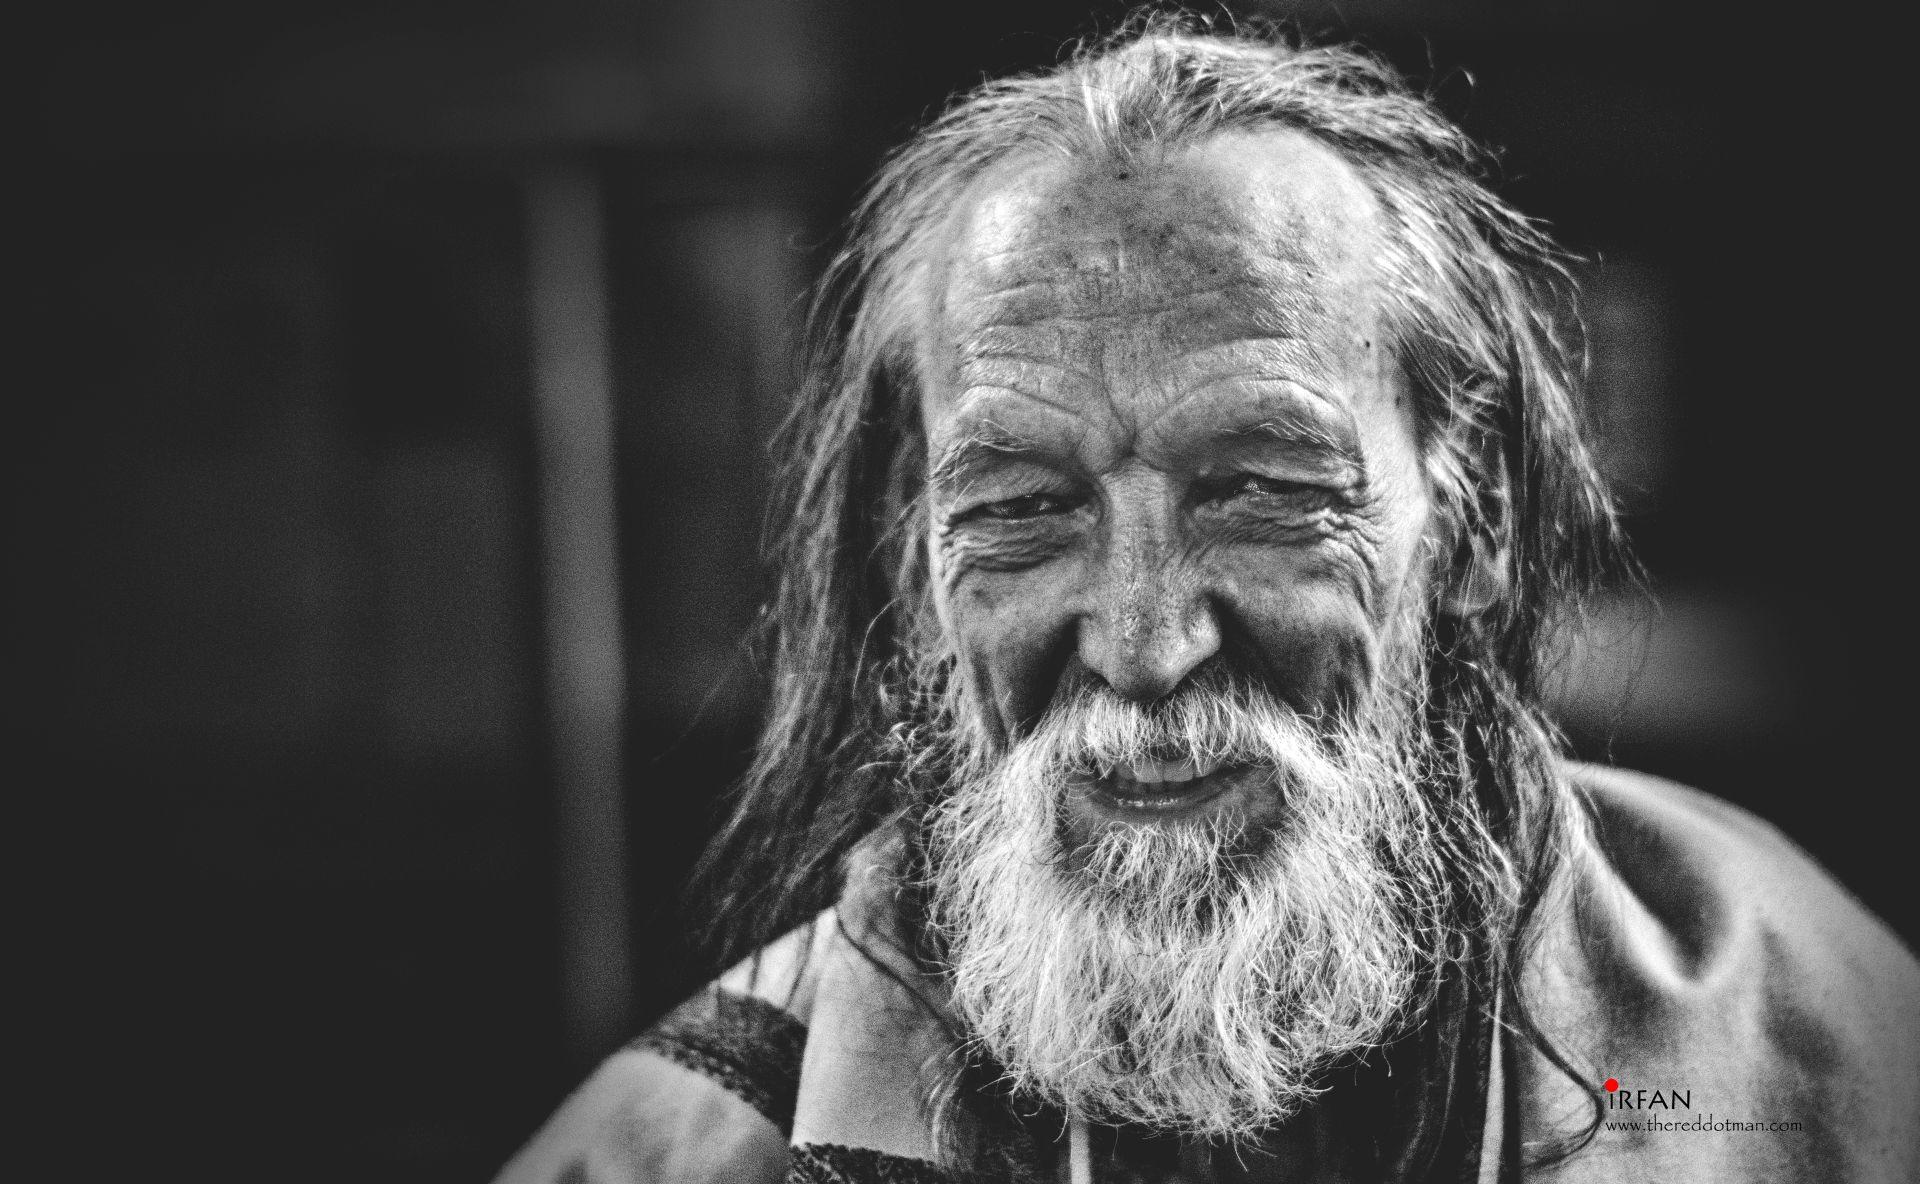 old man, railway station, bangalore, portrait, black and white, irfan hussain, thereddotman